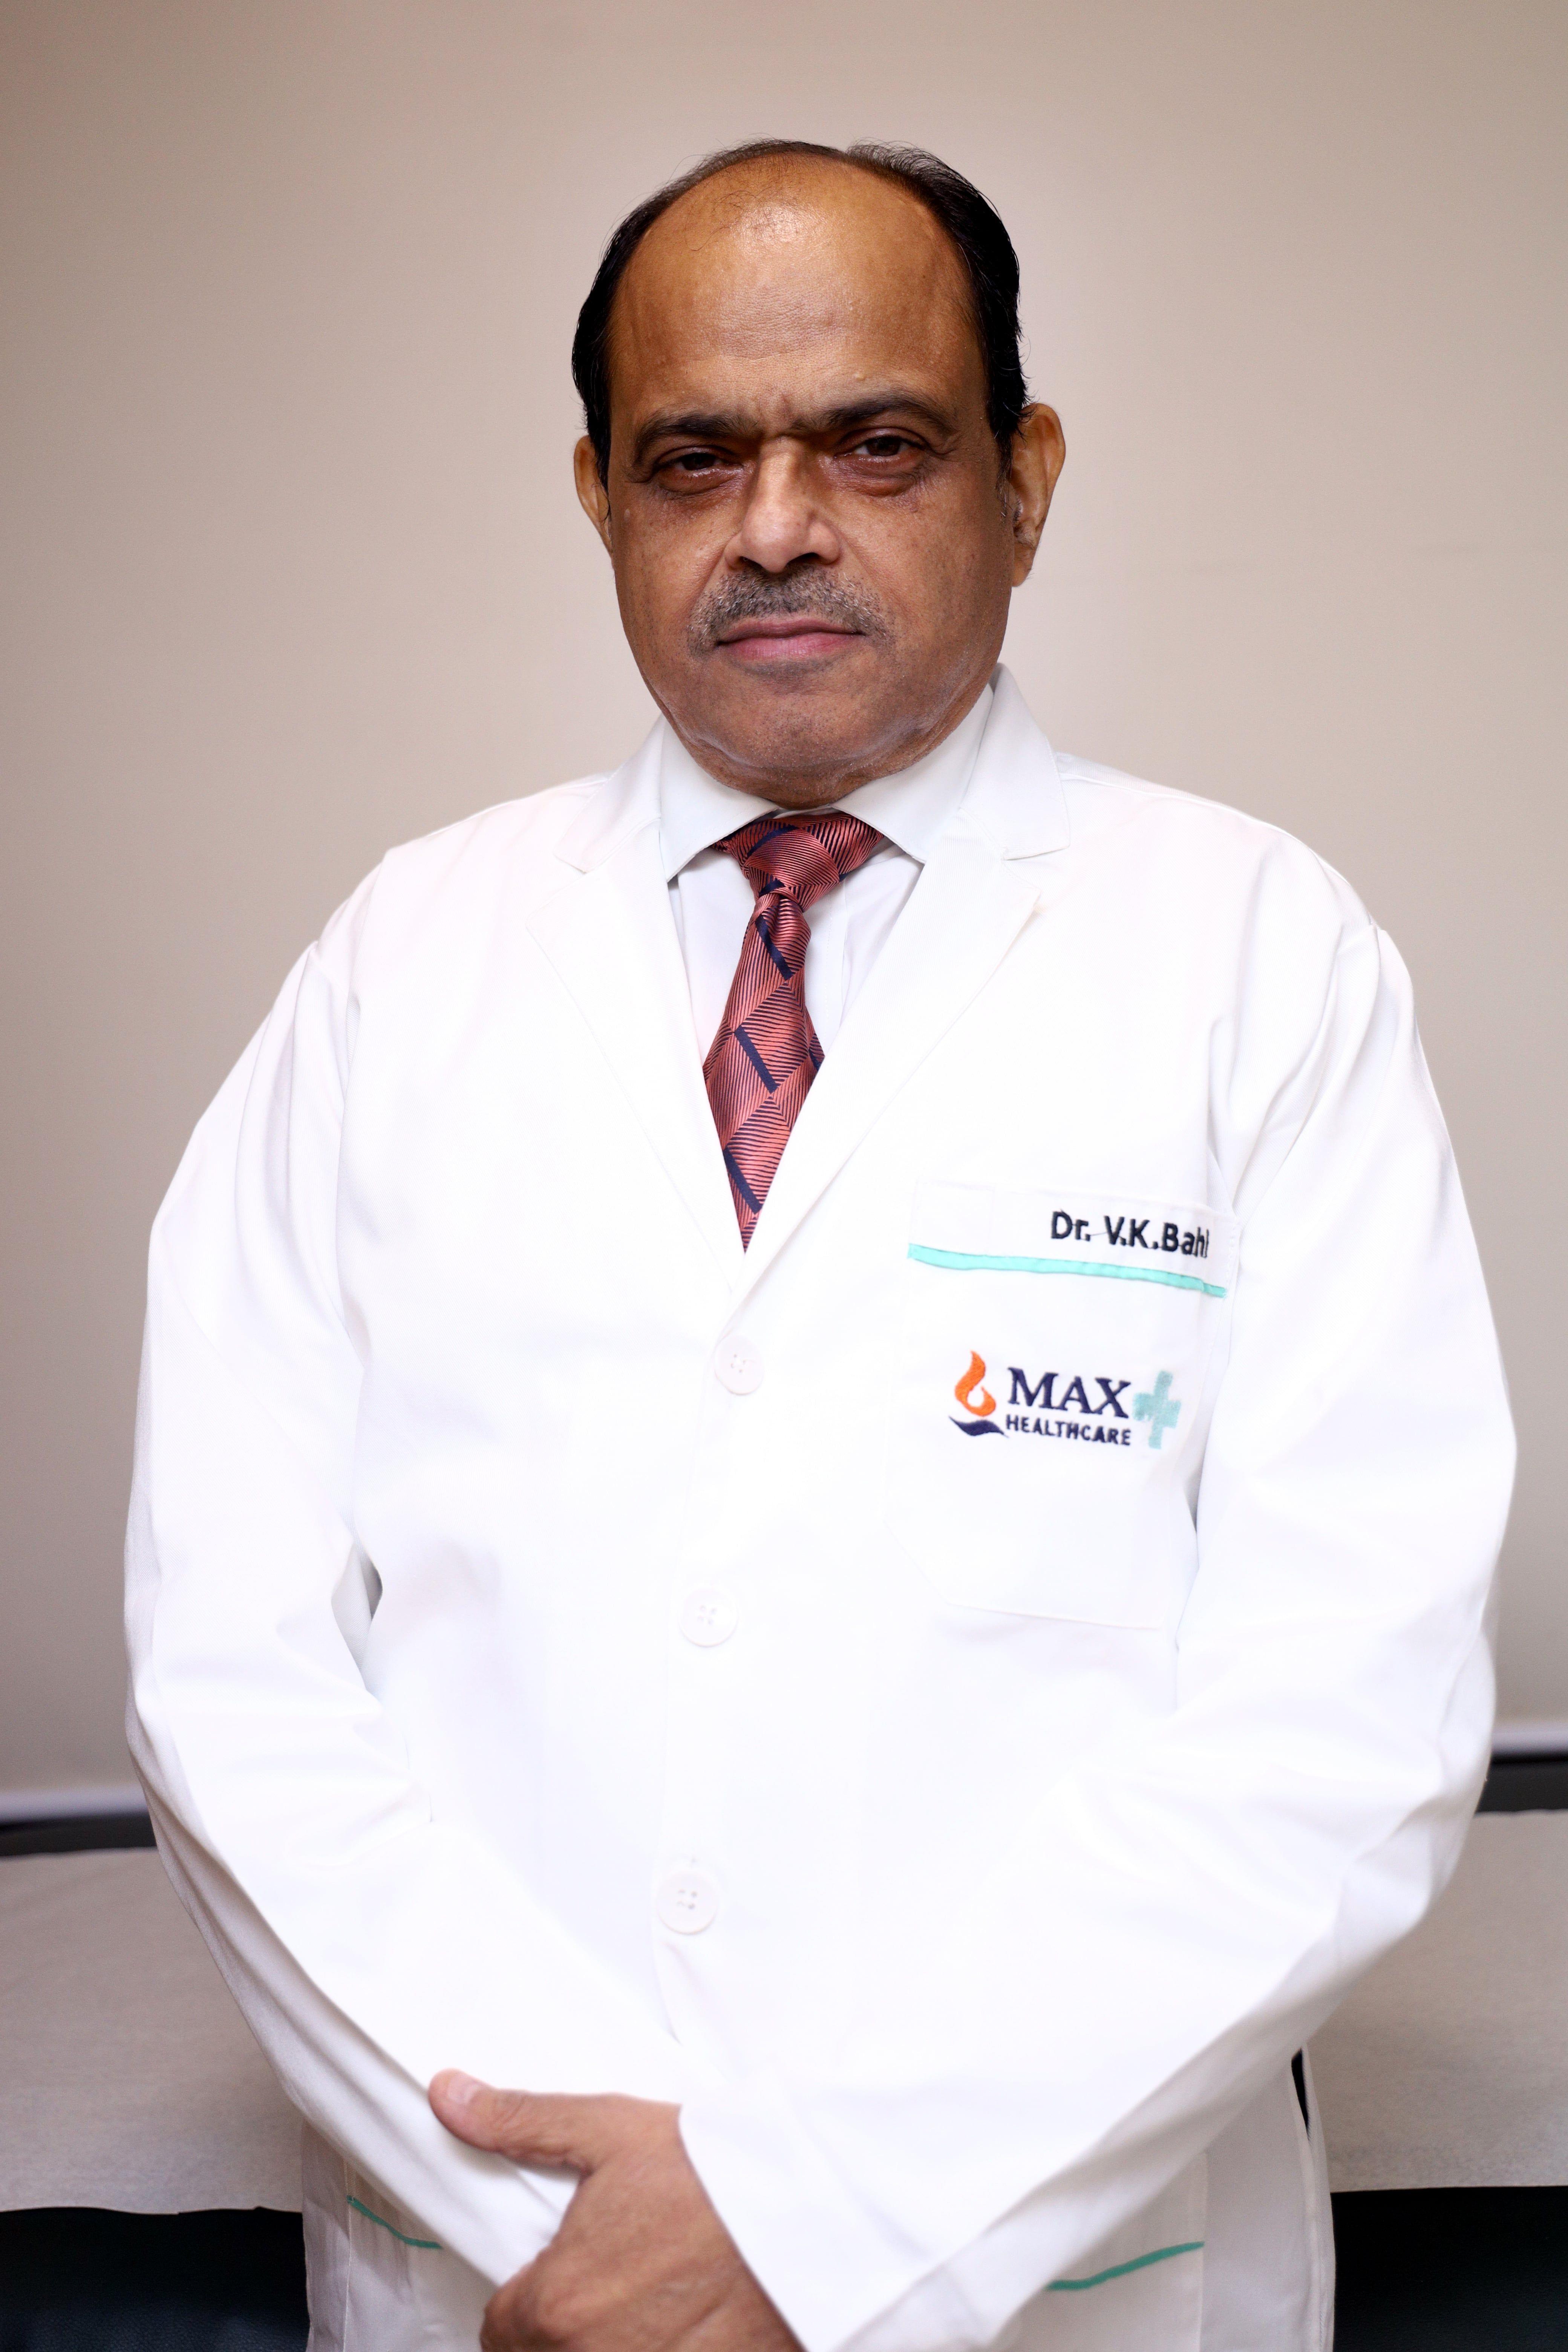 Dr. Vinay Kumar Bahl